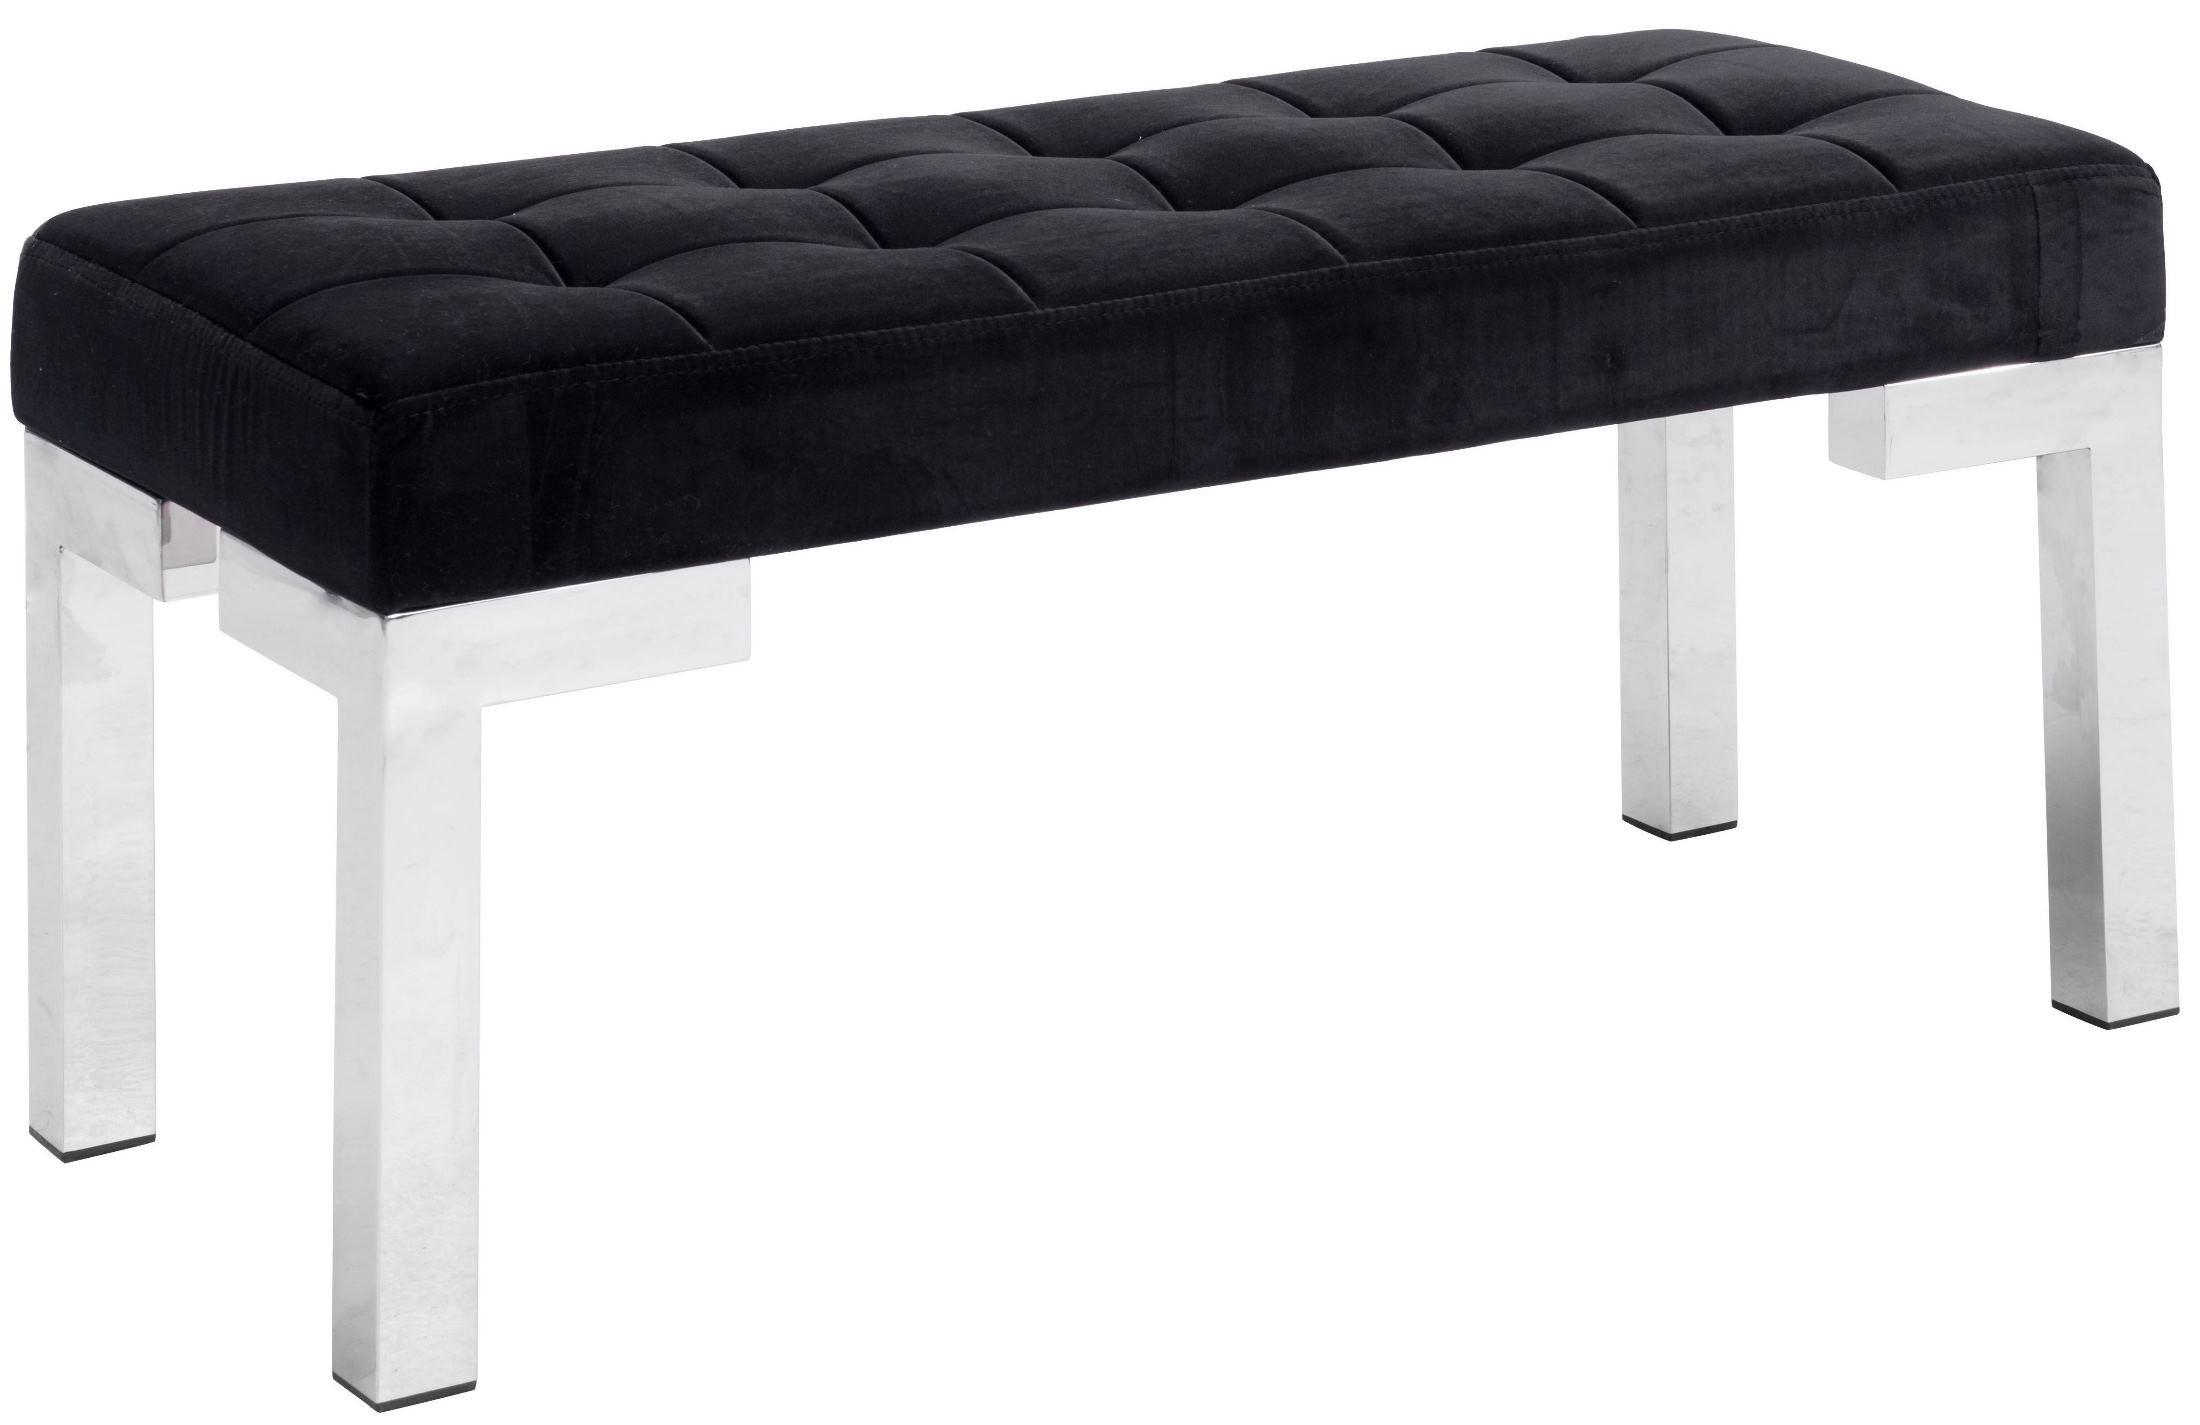 Partner Black Velvet Bench From Zuo Mod 100197 Coleman Furniture